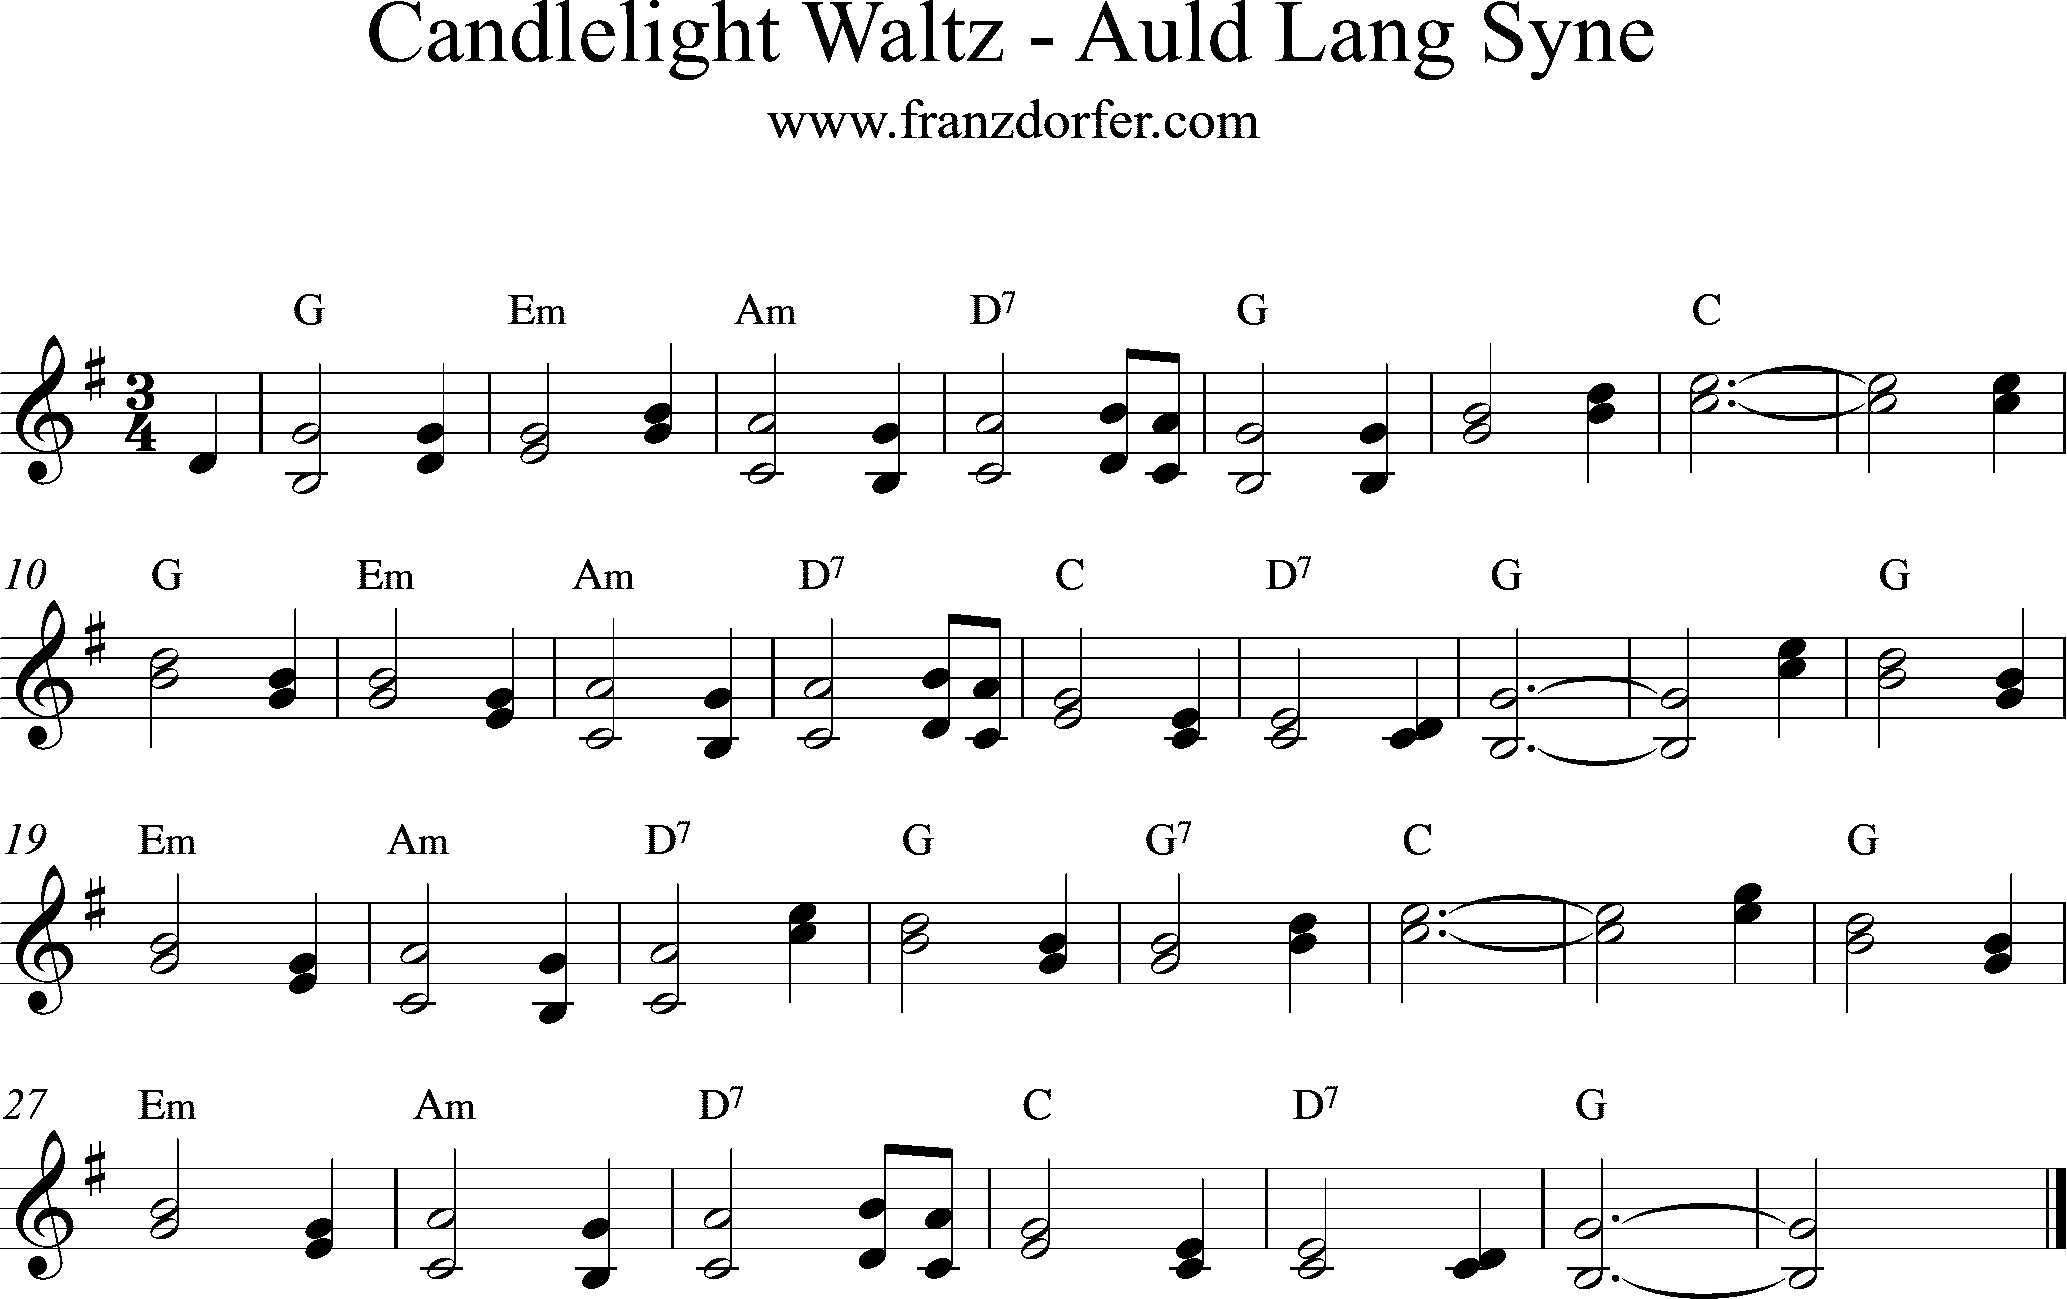 Candlelight Waltz